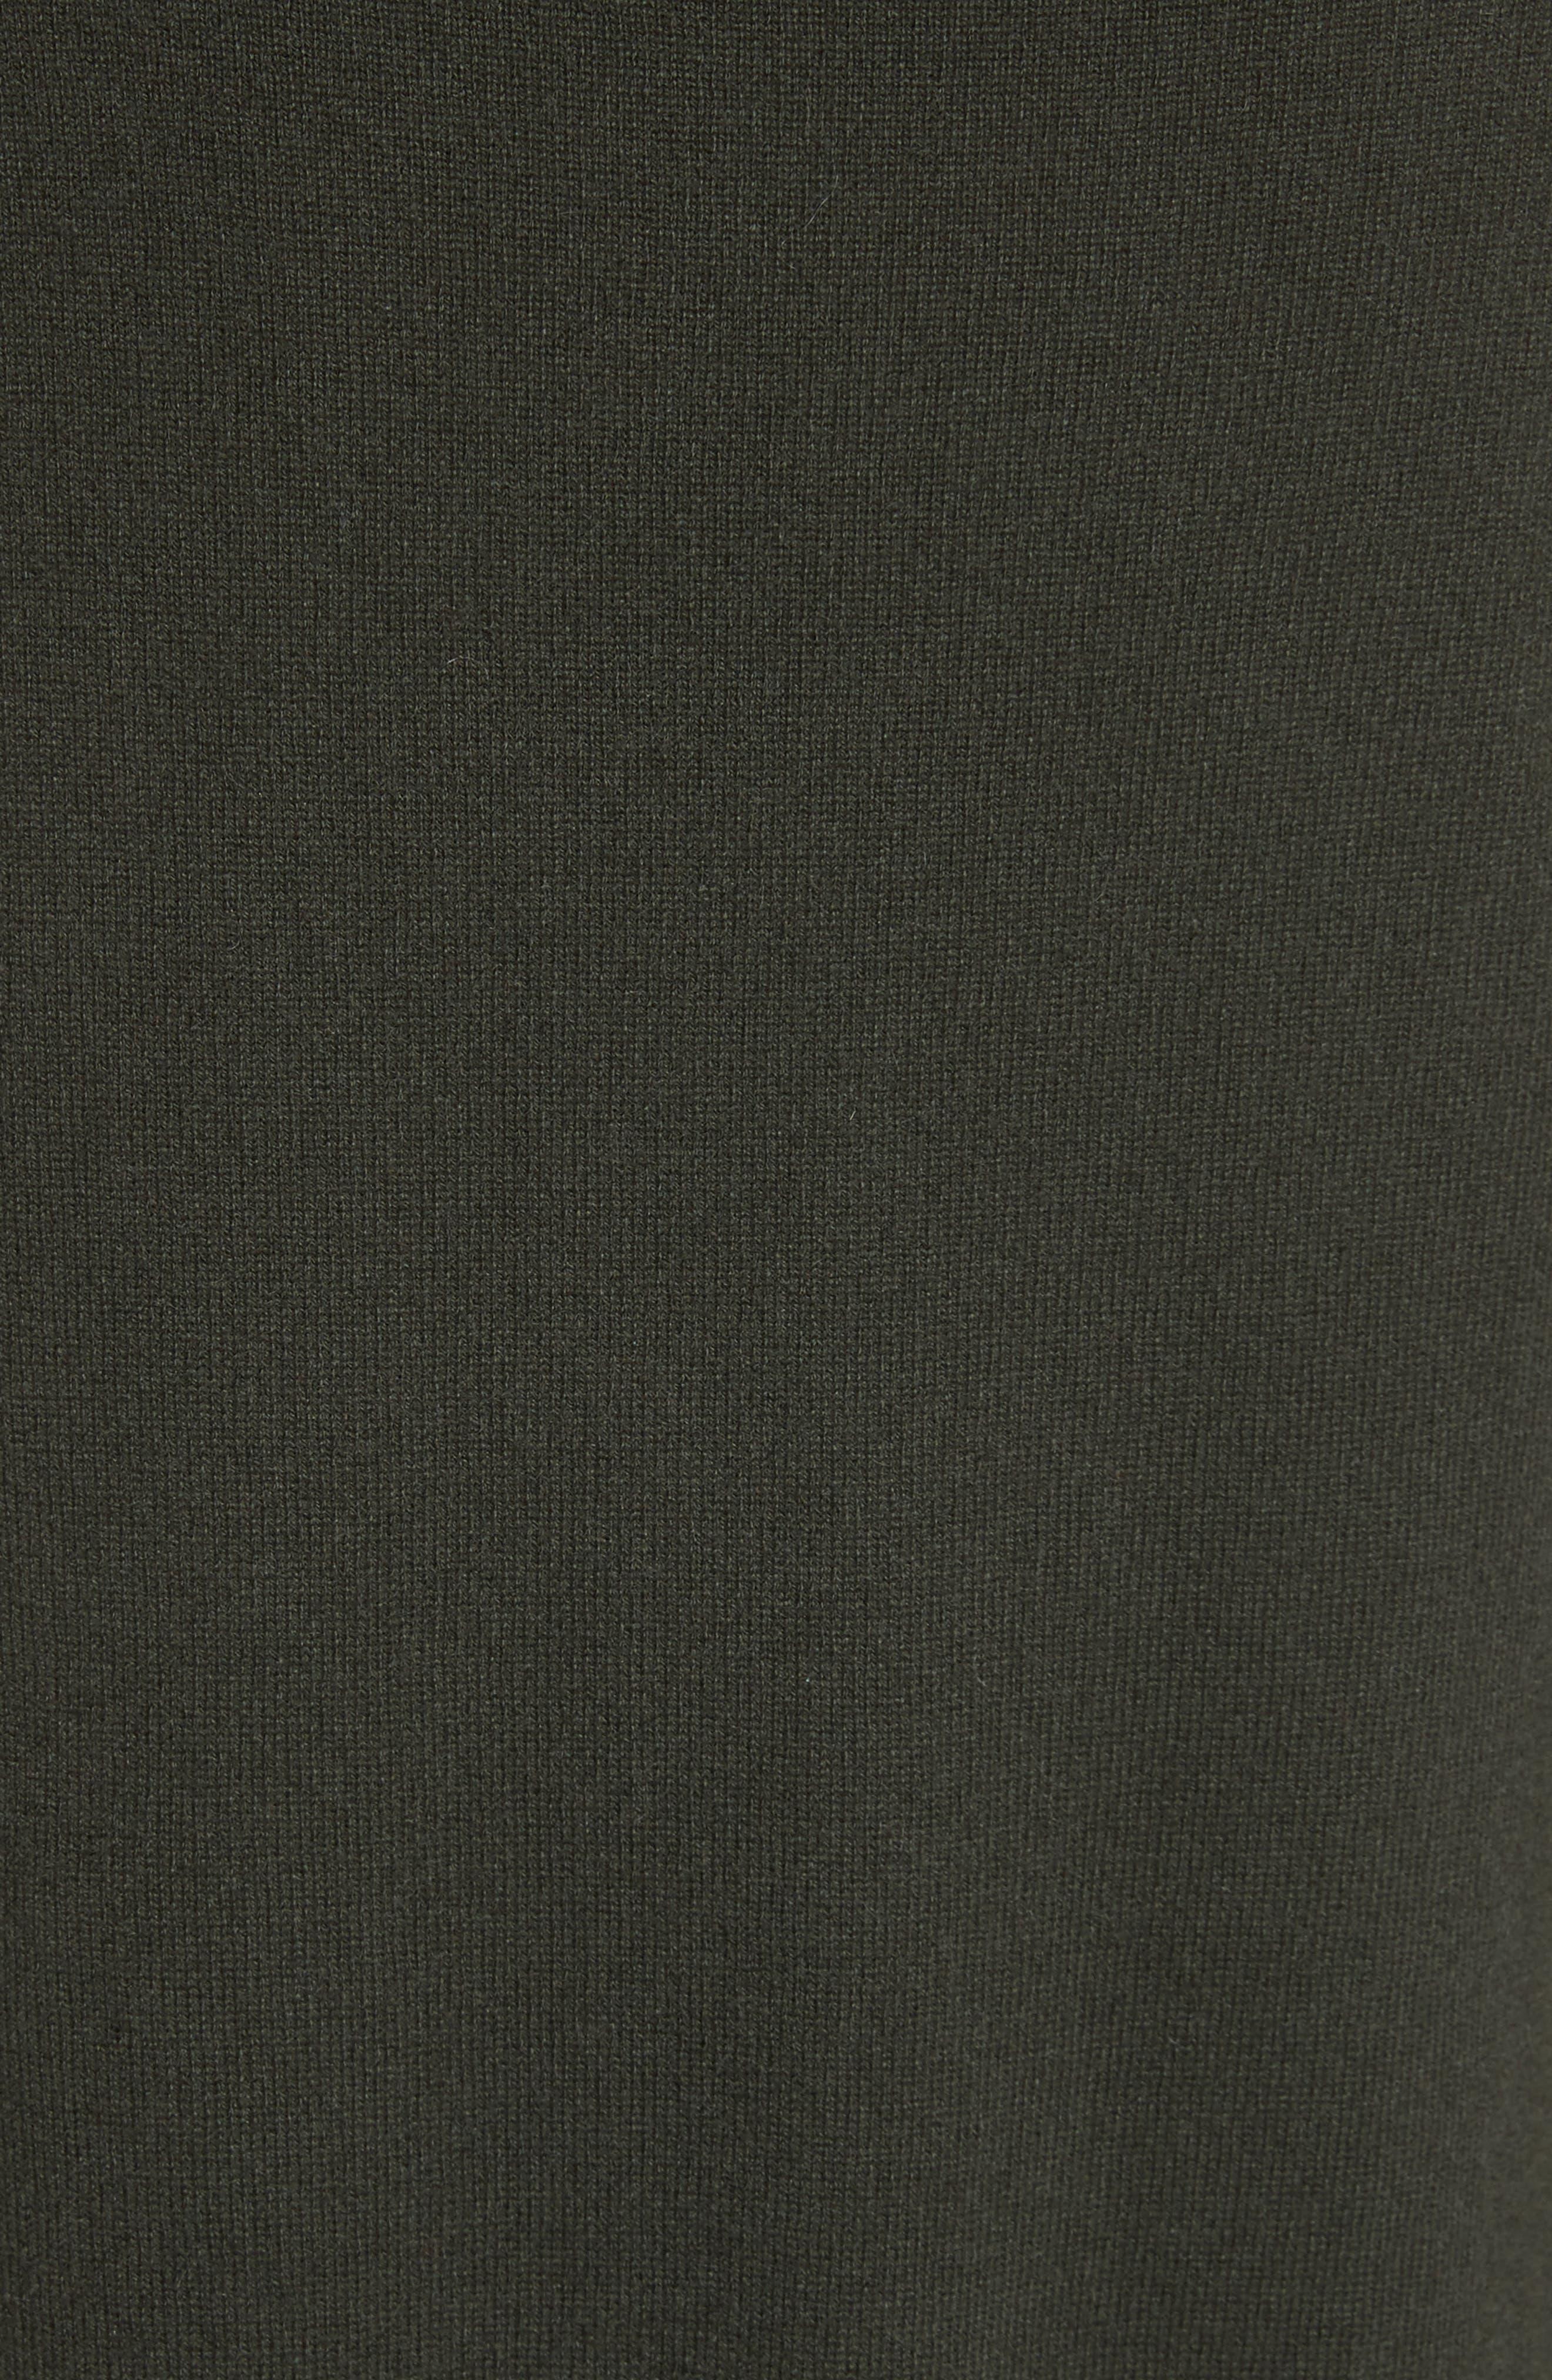 Cashmere Turtleneck Sweater Dress,                             Alternate thumbnail 5, color,                             300